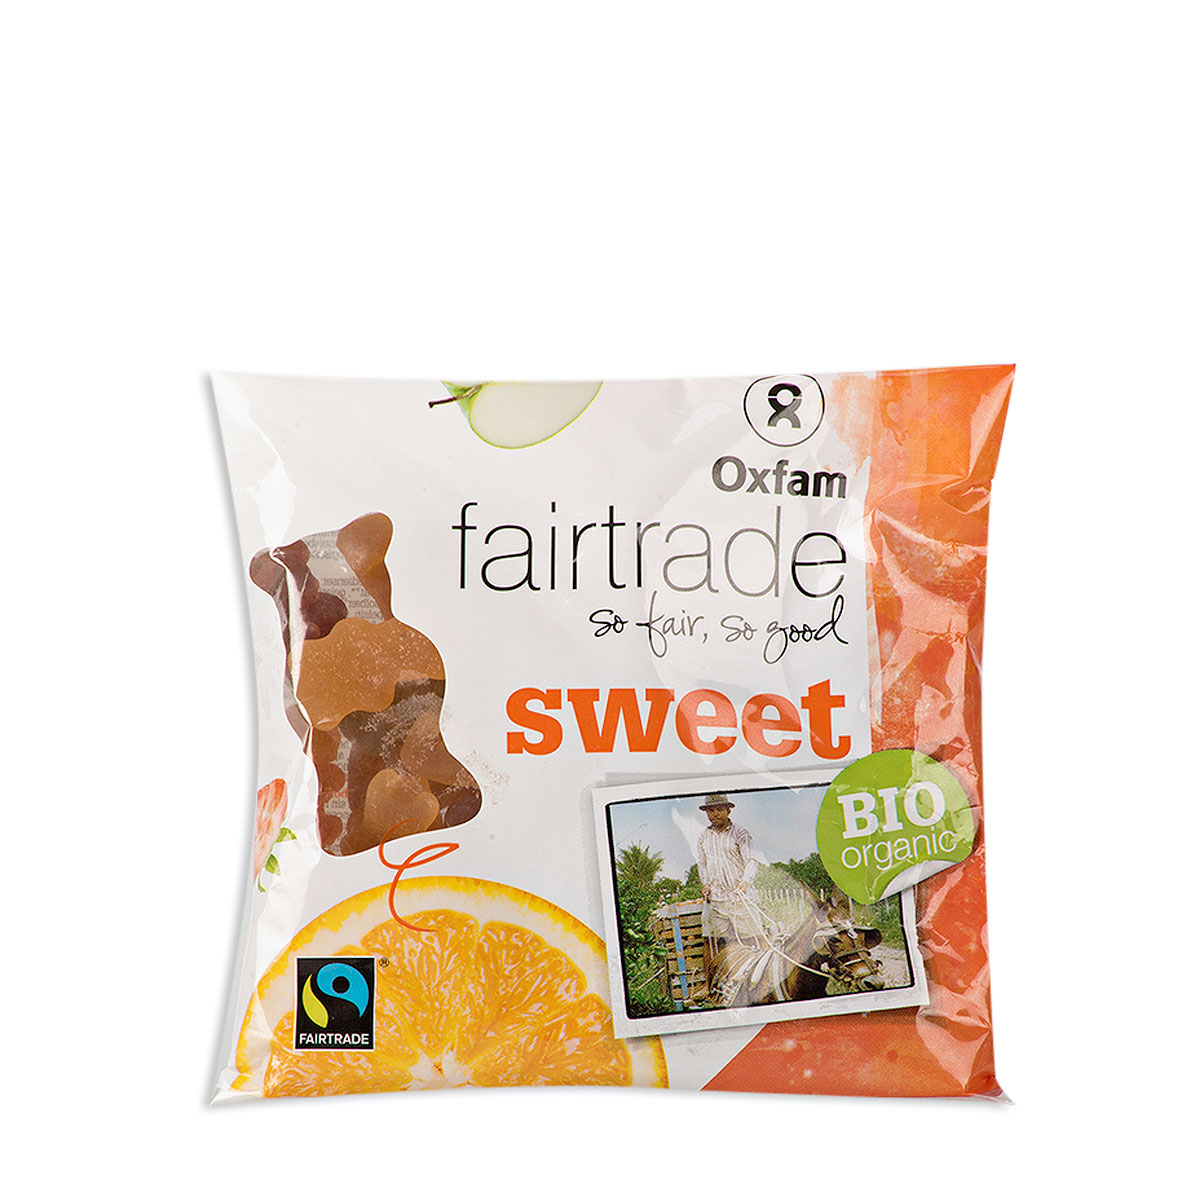 Panier Cadeau Bonbon : Panier cadeau de bonbons fair trade oxfam cadofrance